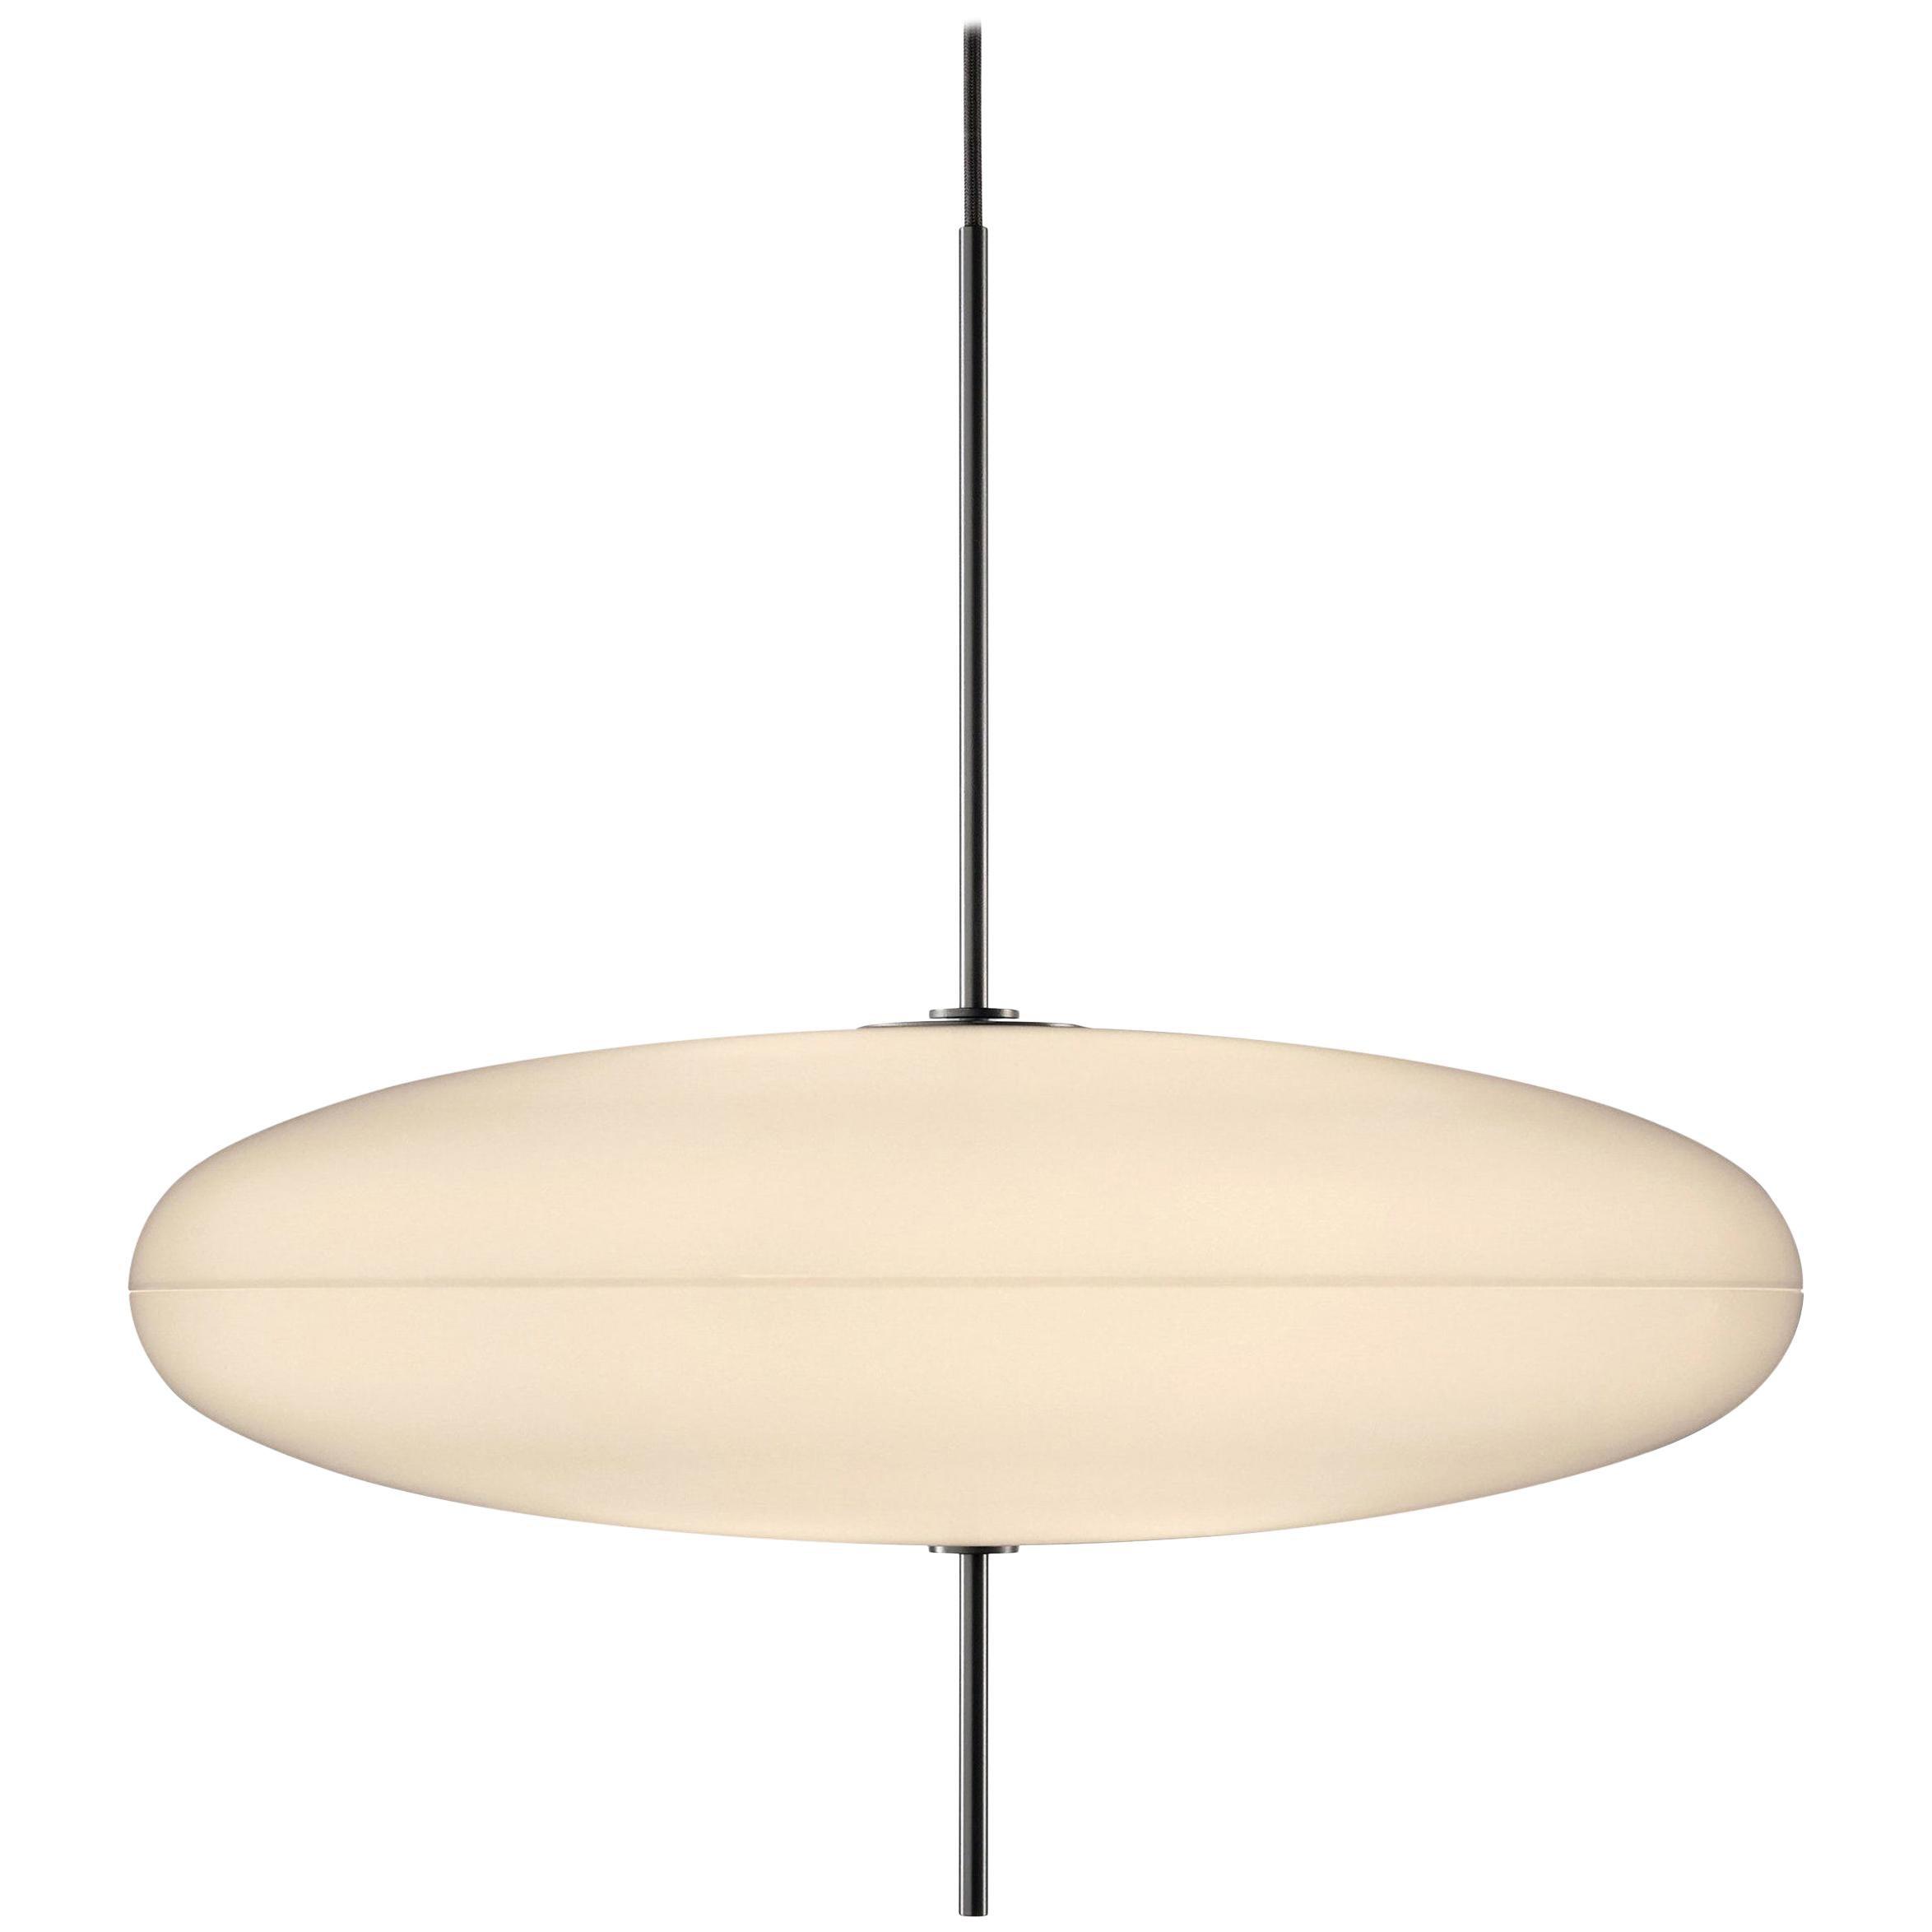 Gino Sarfatti Model No. 2065 Ceiling Light